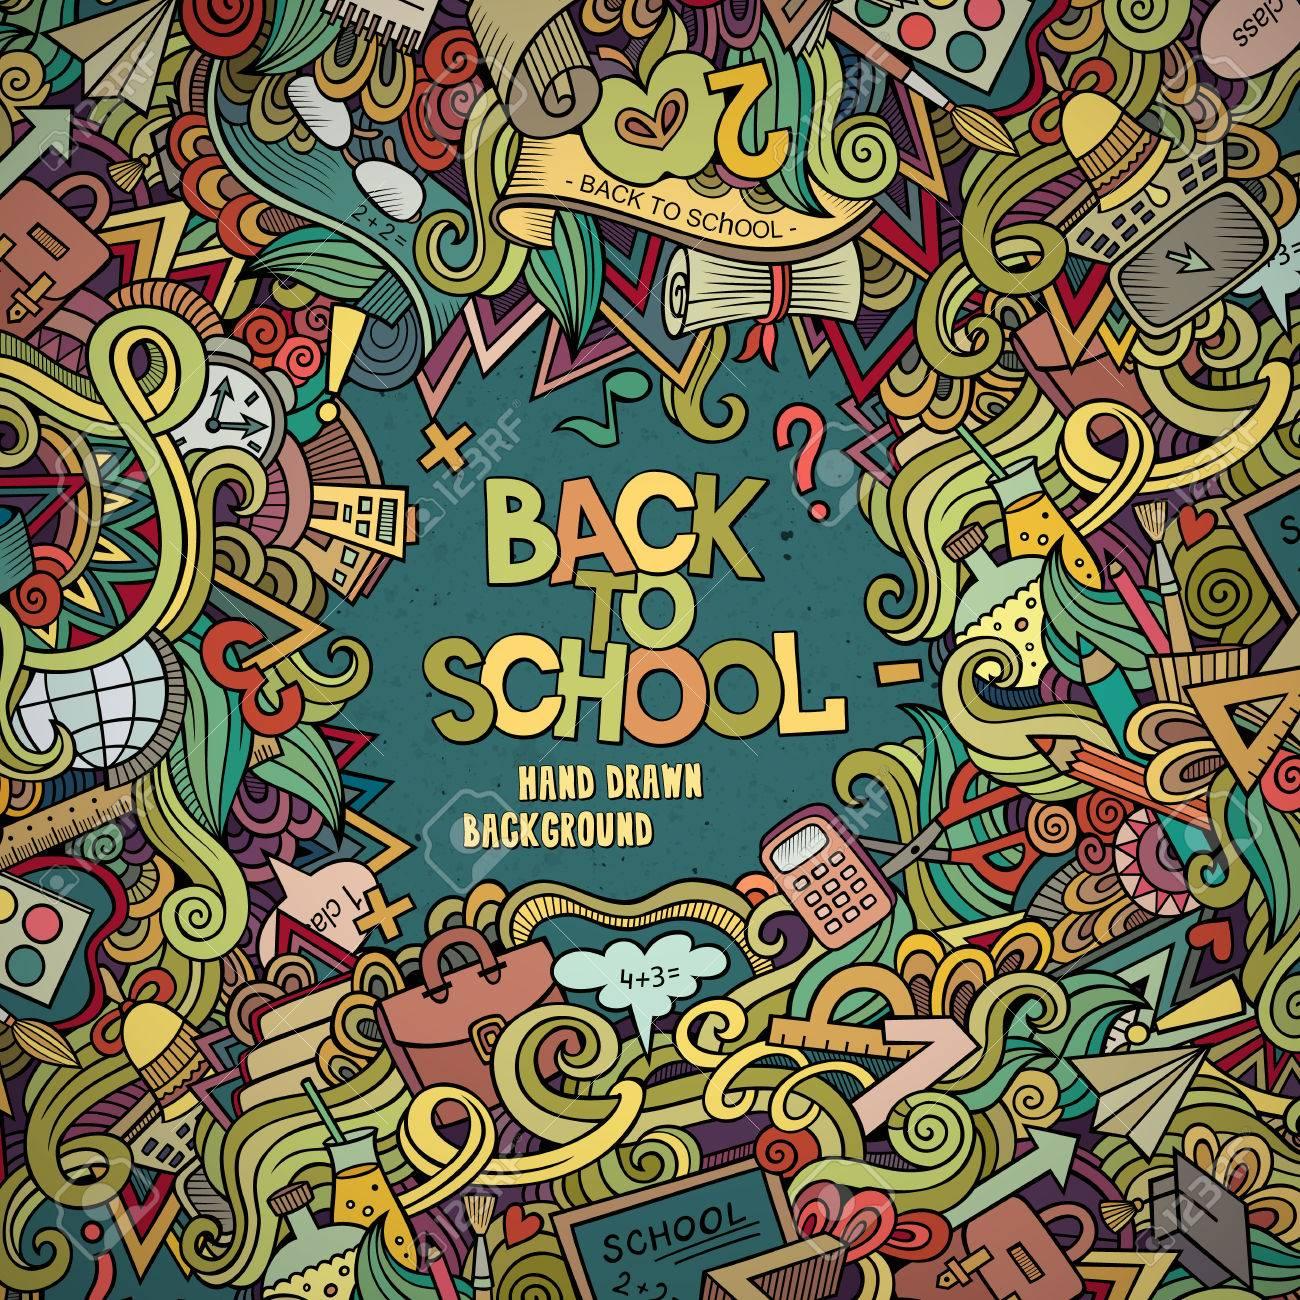 Cartoon vector doodles hand drawn school frame card design background - 42034249